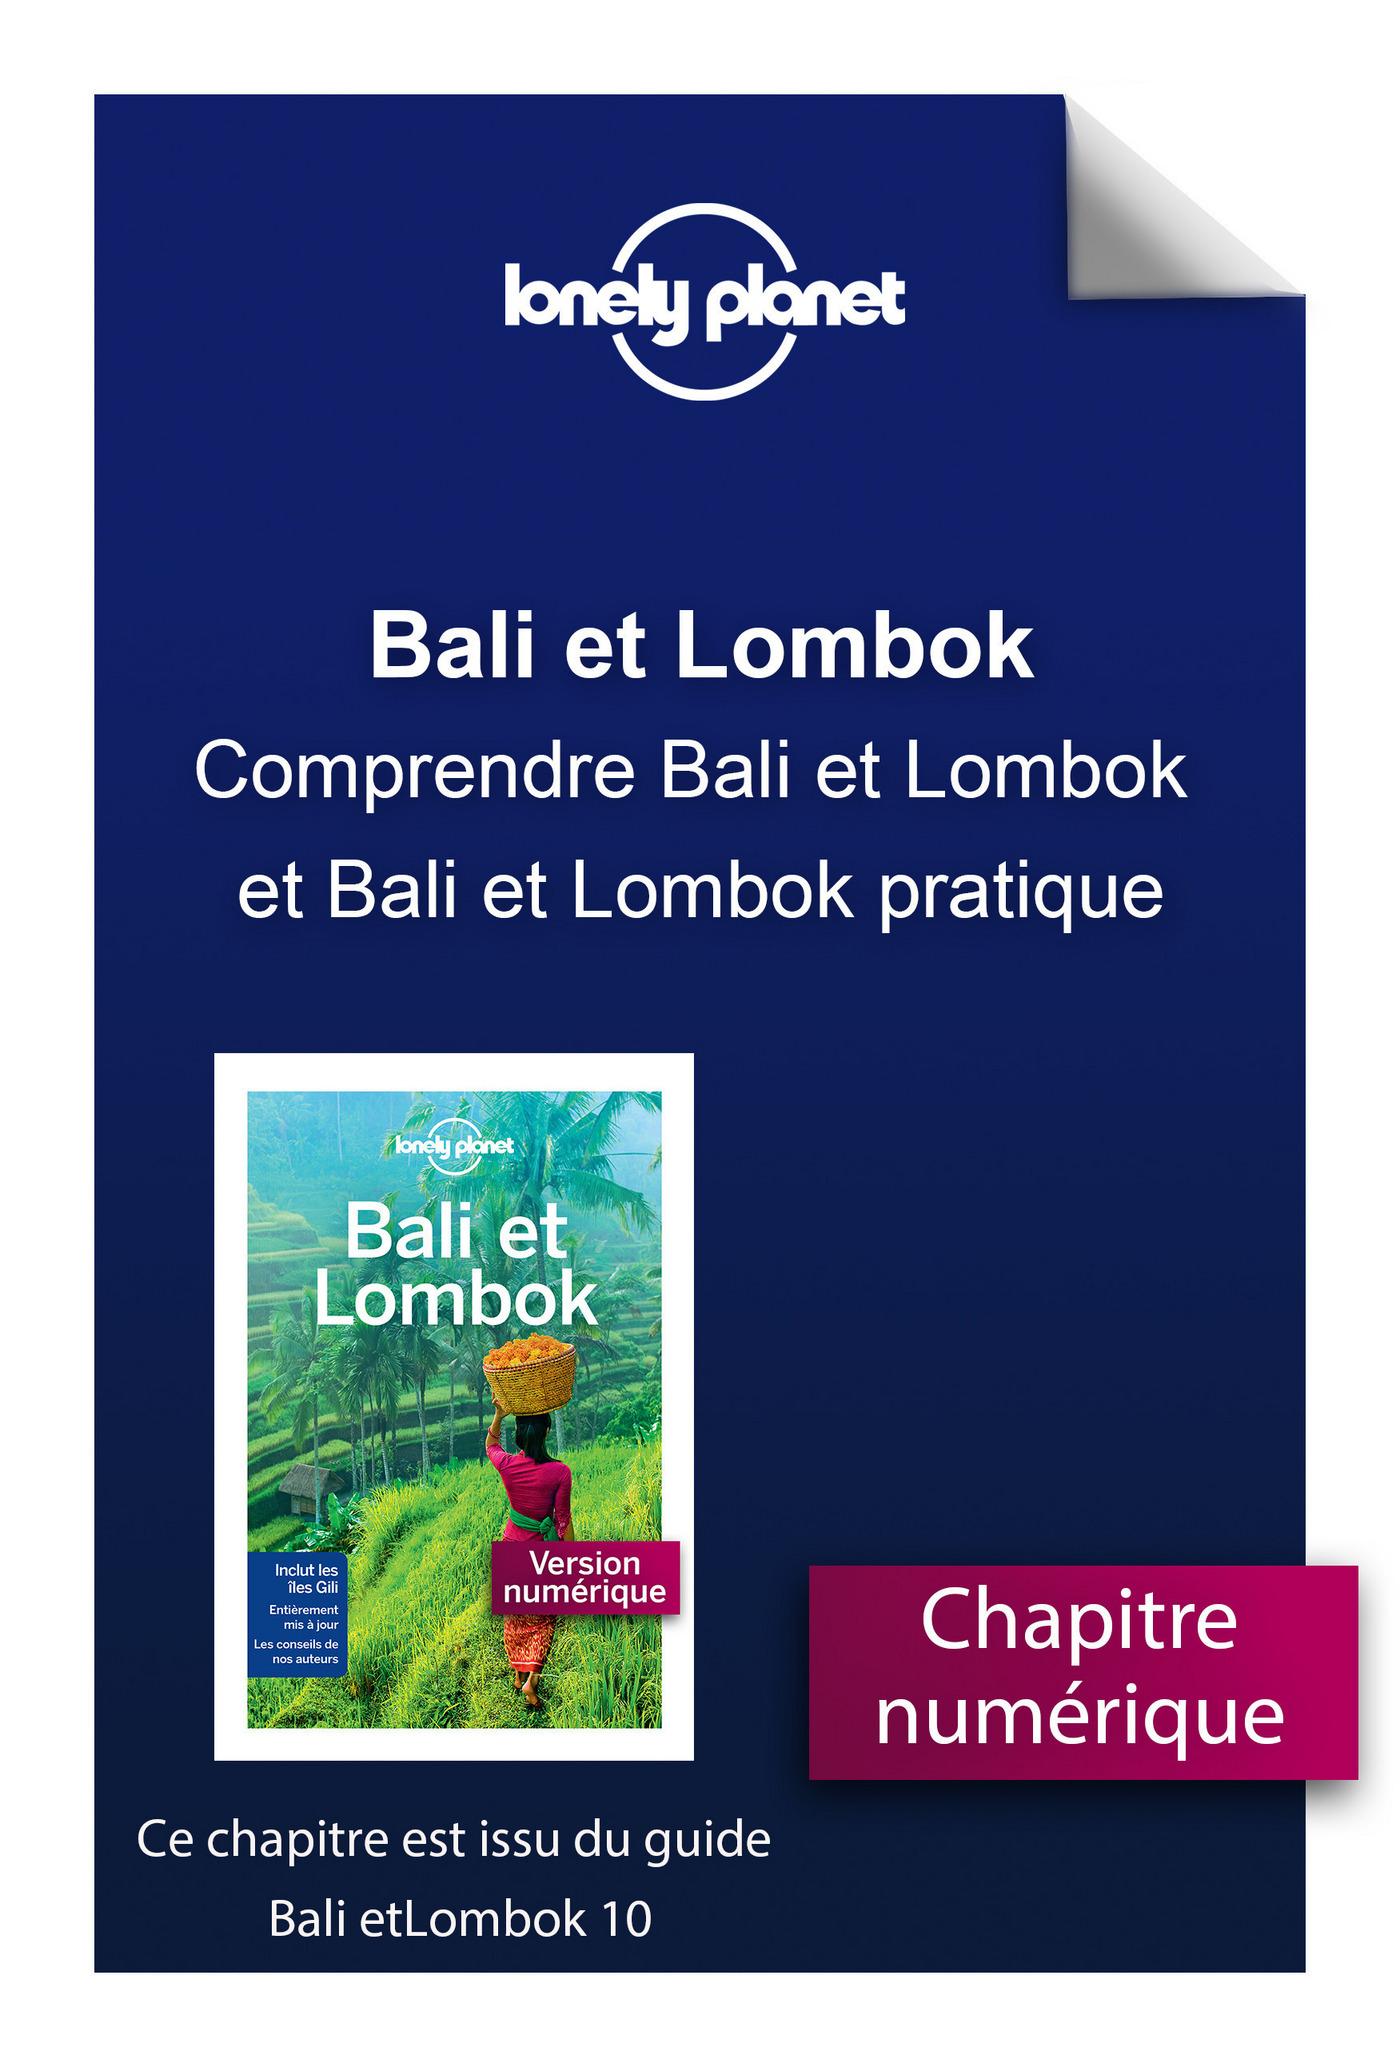 Bali et Lombok - Comprendre Bali et Lombok et Bali et Lombok pratique